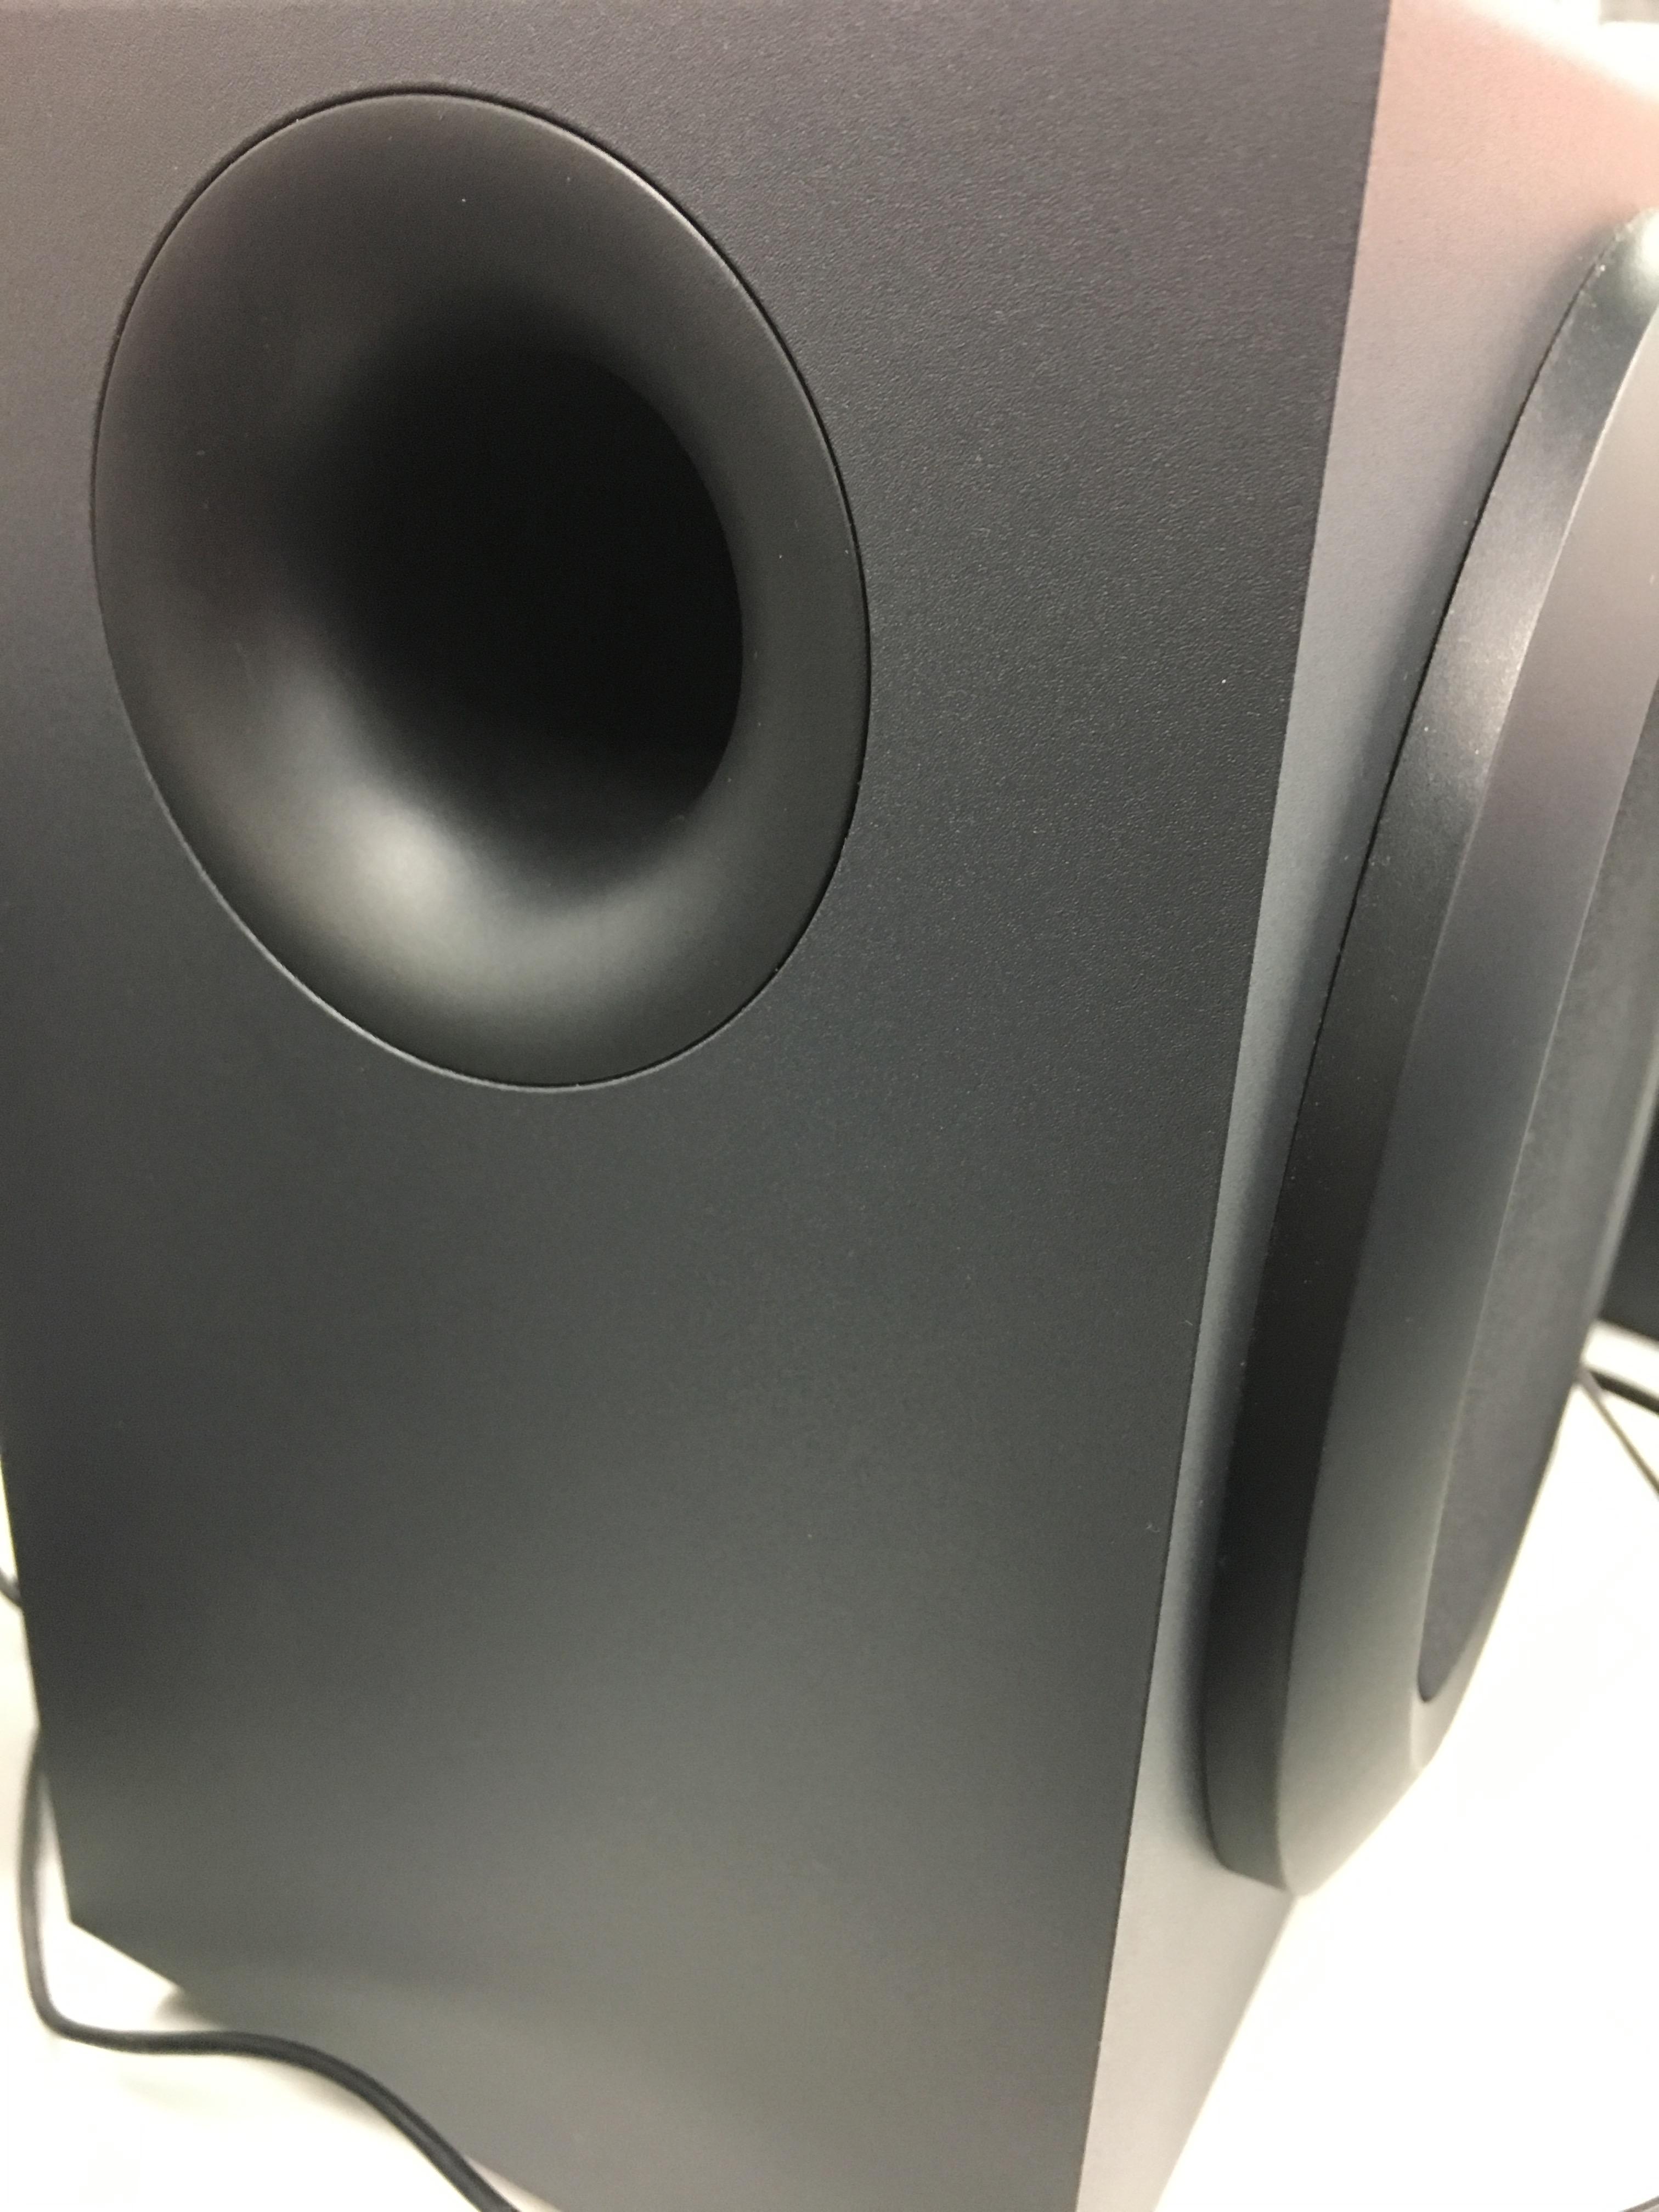 Atemberaubend Computer Lautsprecher Schaltplan Fotos ...